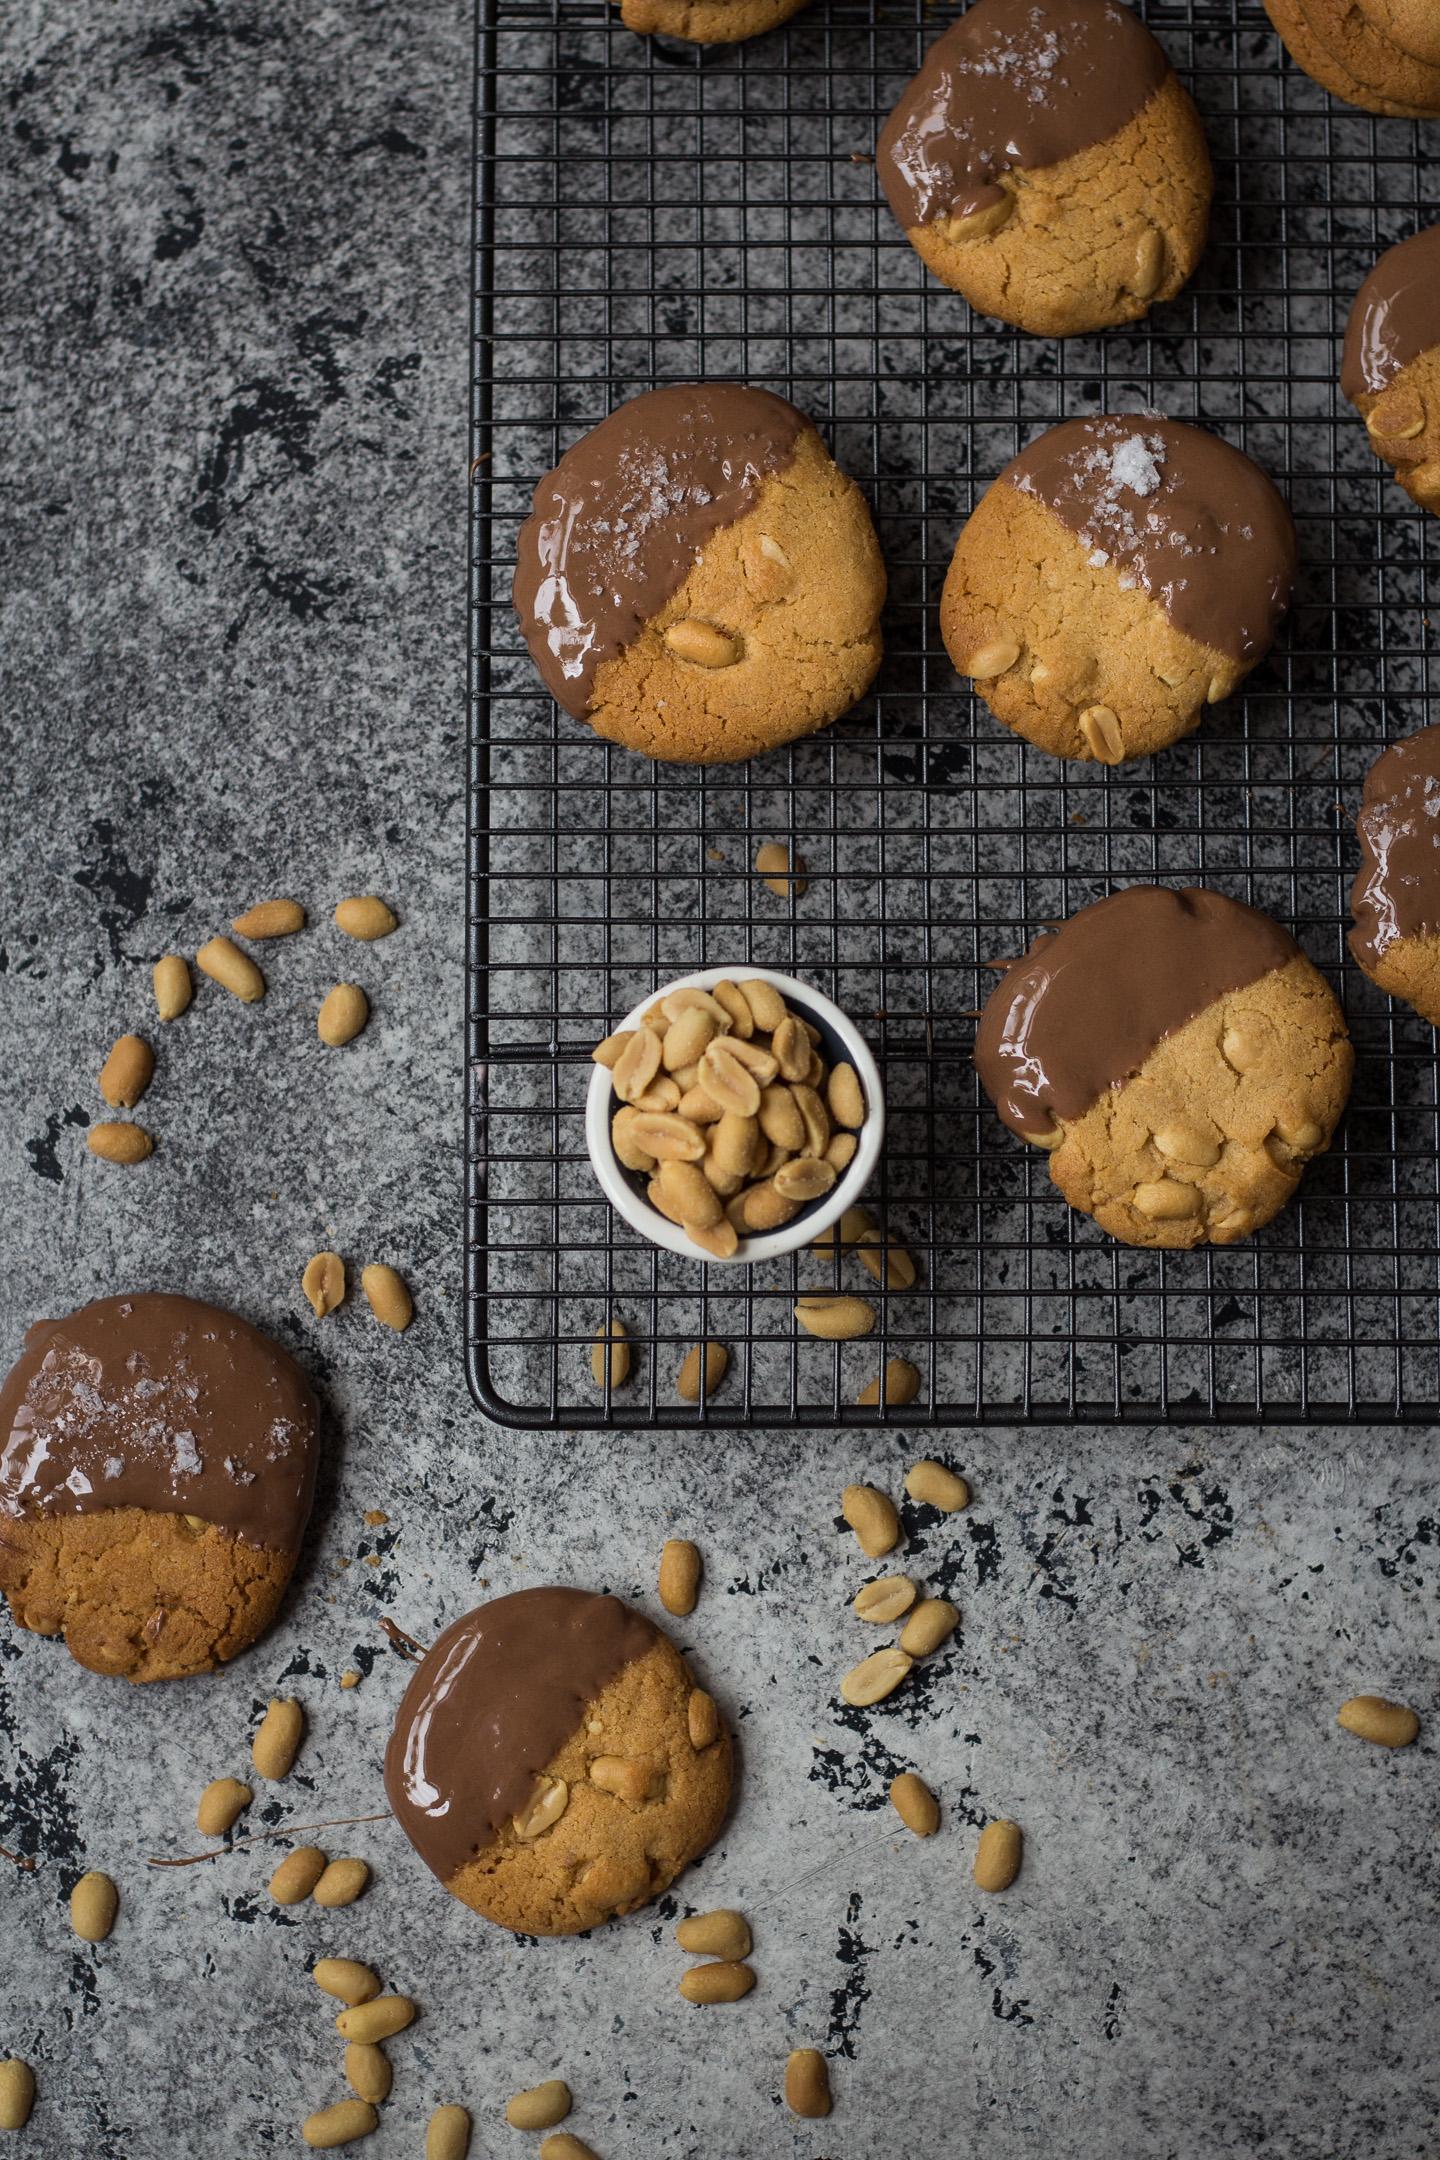 salted-peanut-butter-cookie-gluten-free-recipe-6